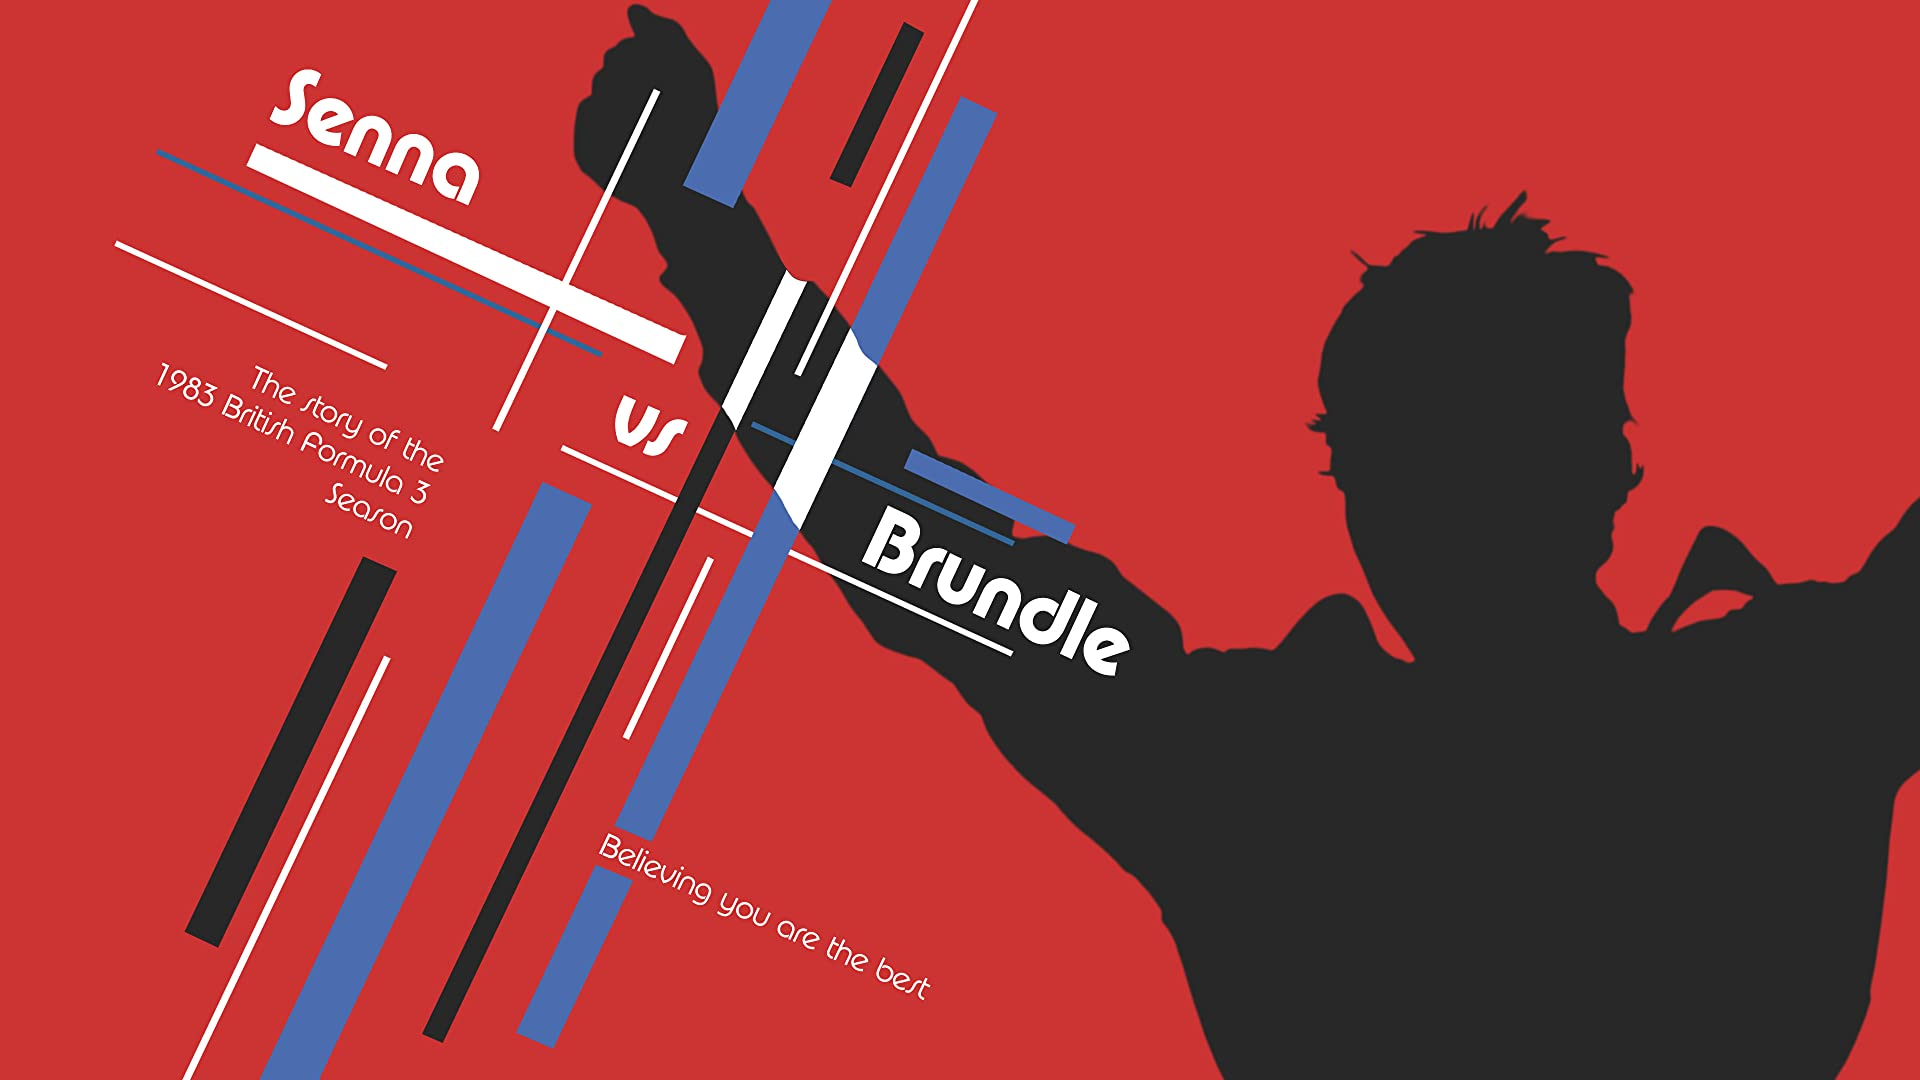 Senna Vs. Brundle